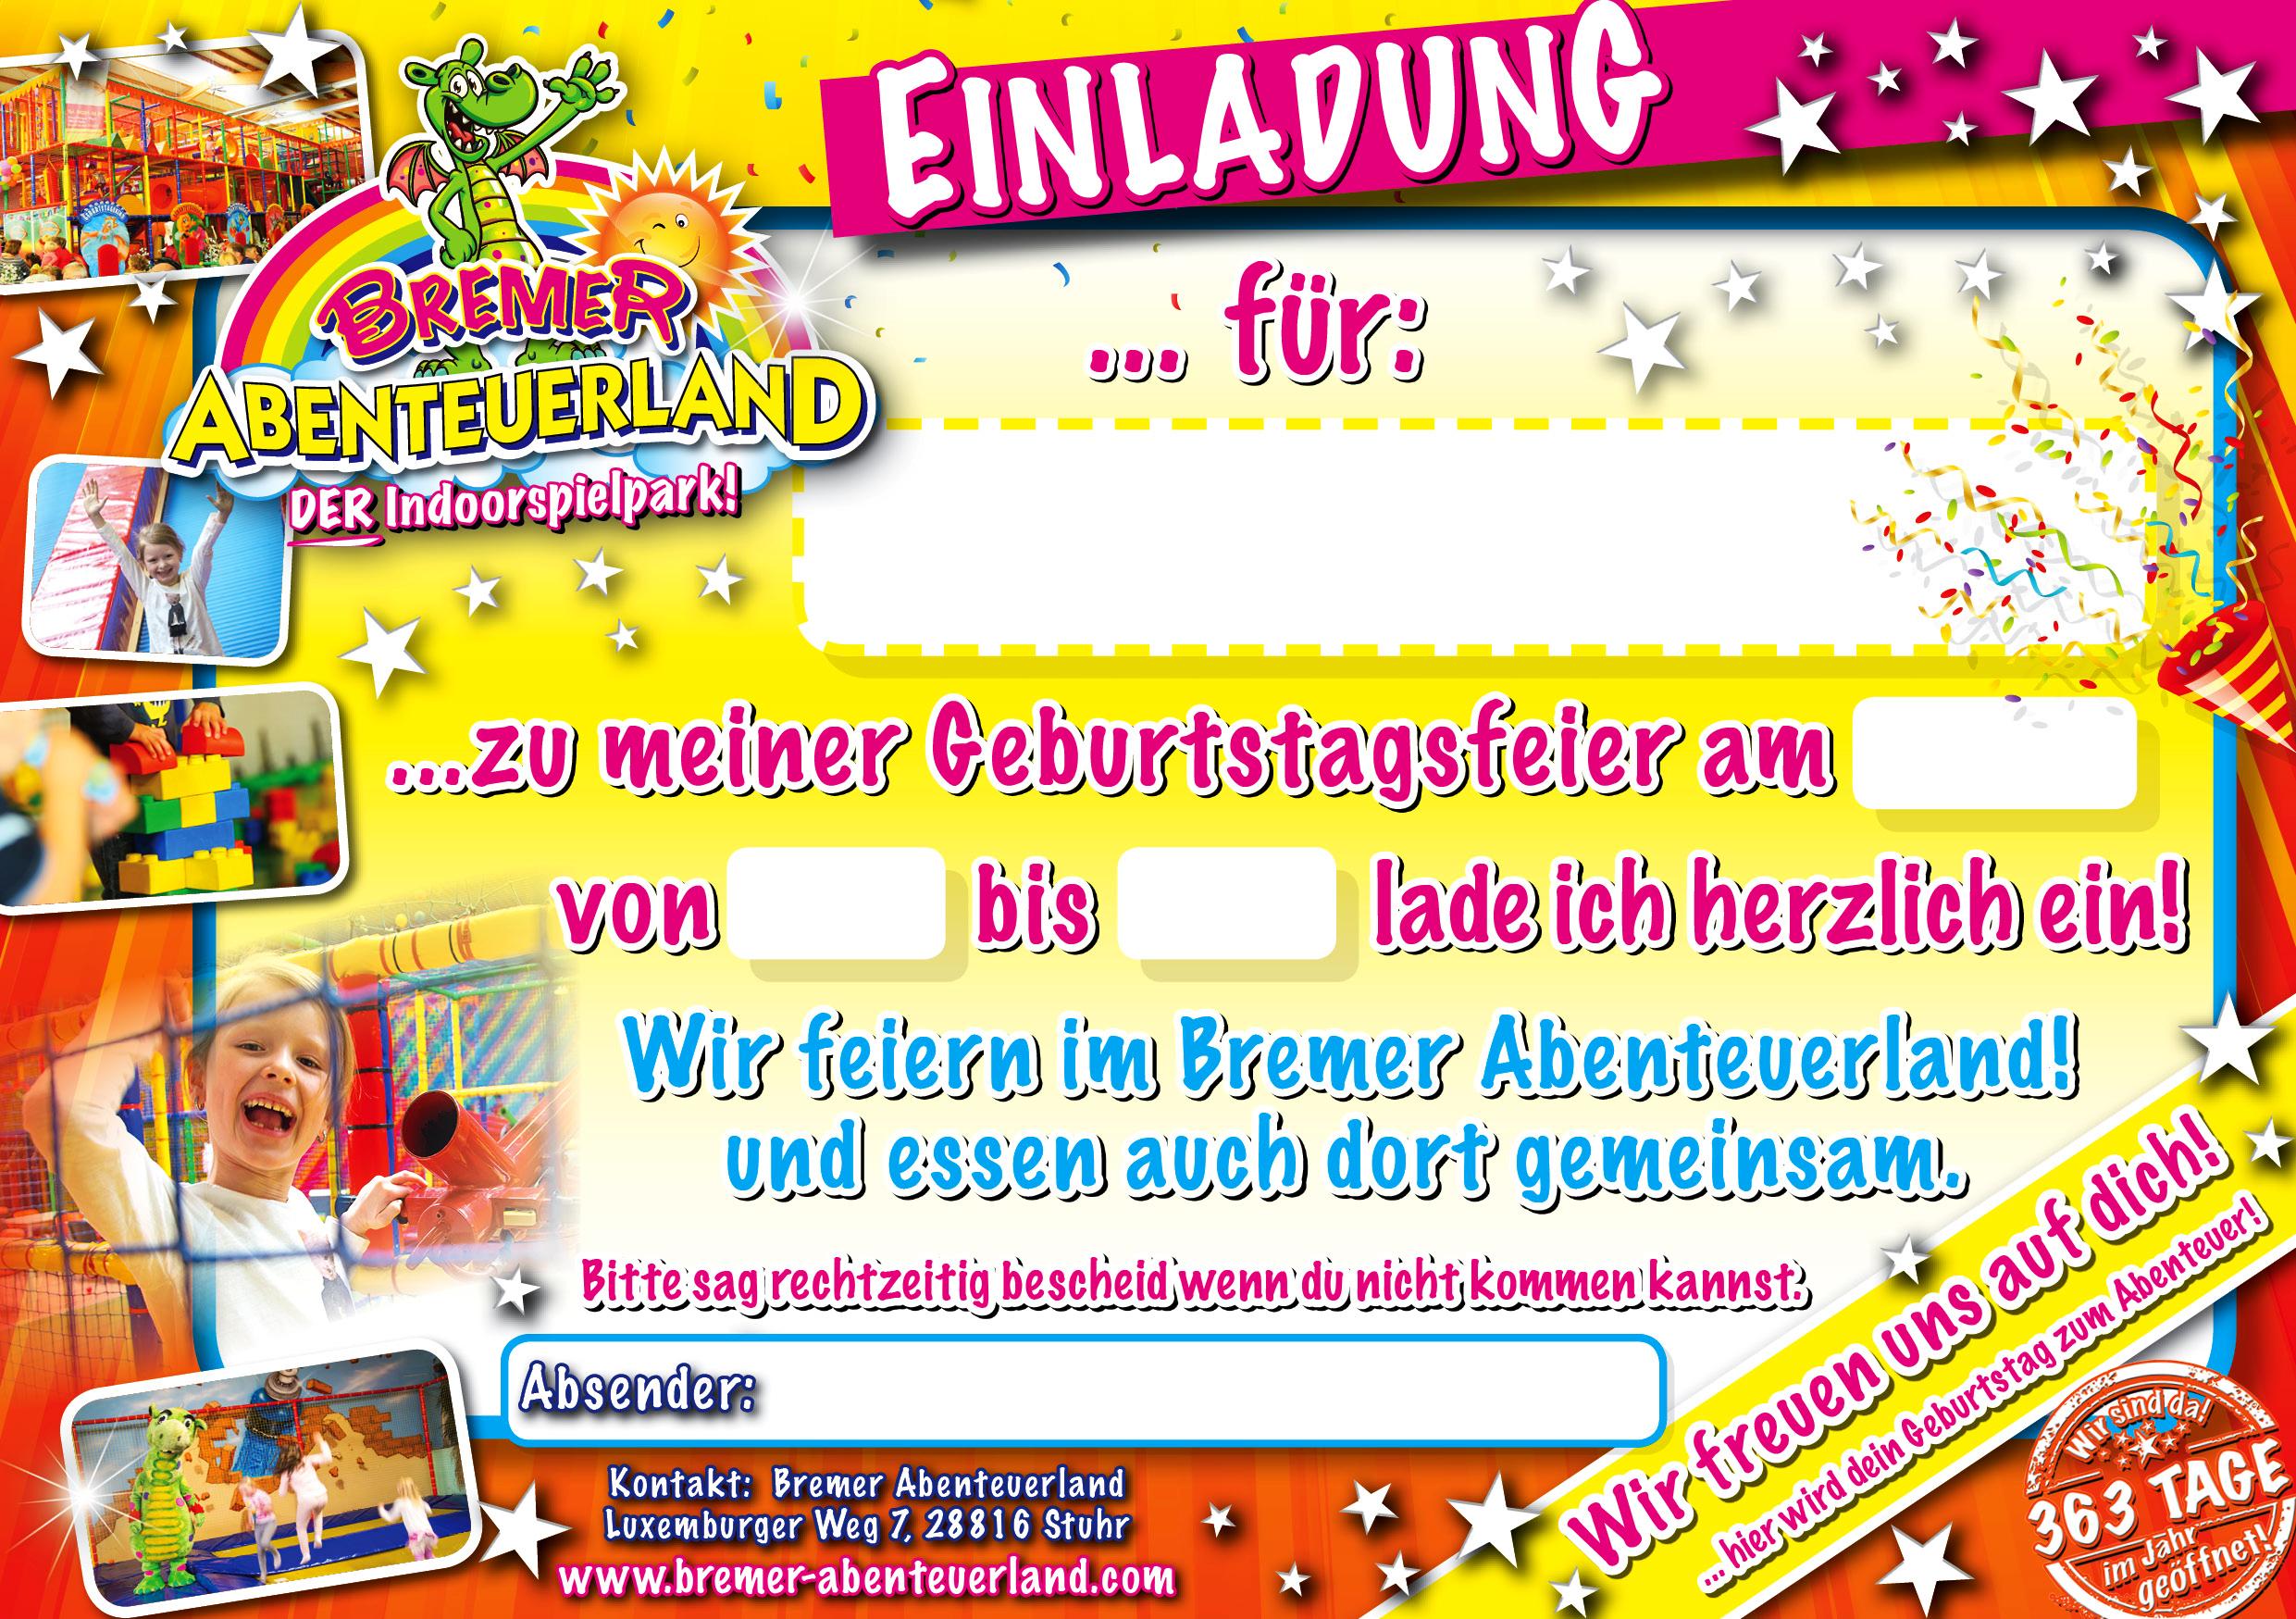 Abenteuerland Geburtstagseinladung | Einladung Zum Geburtstag · U003eu003eu003e Hier ...